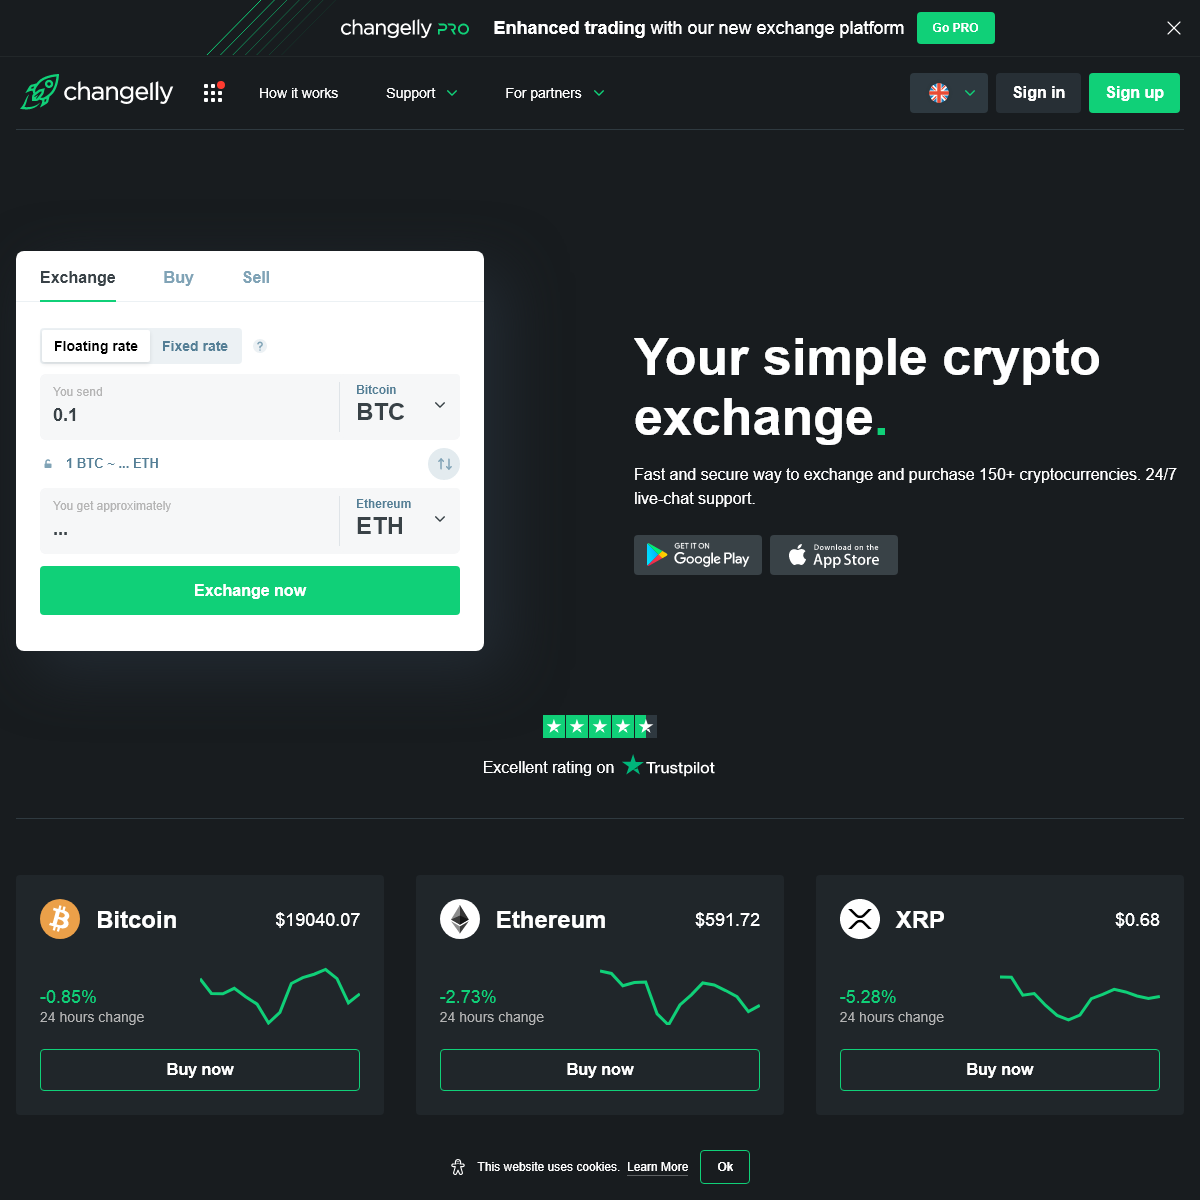 Exchange crypto online — Cryptocurrency exchange platform Changelly